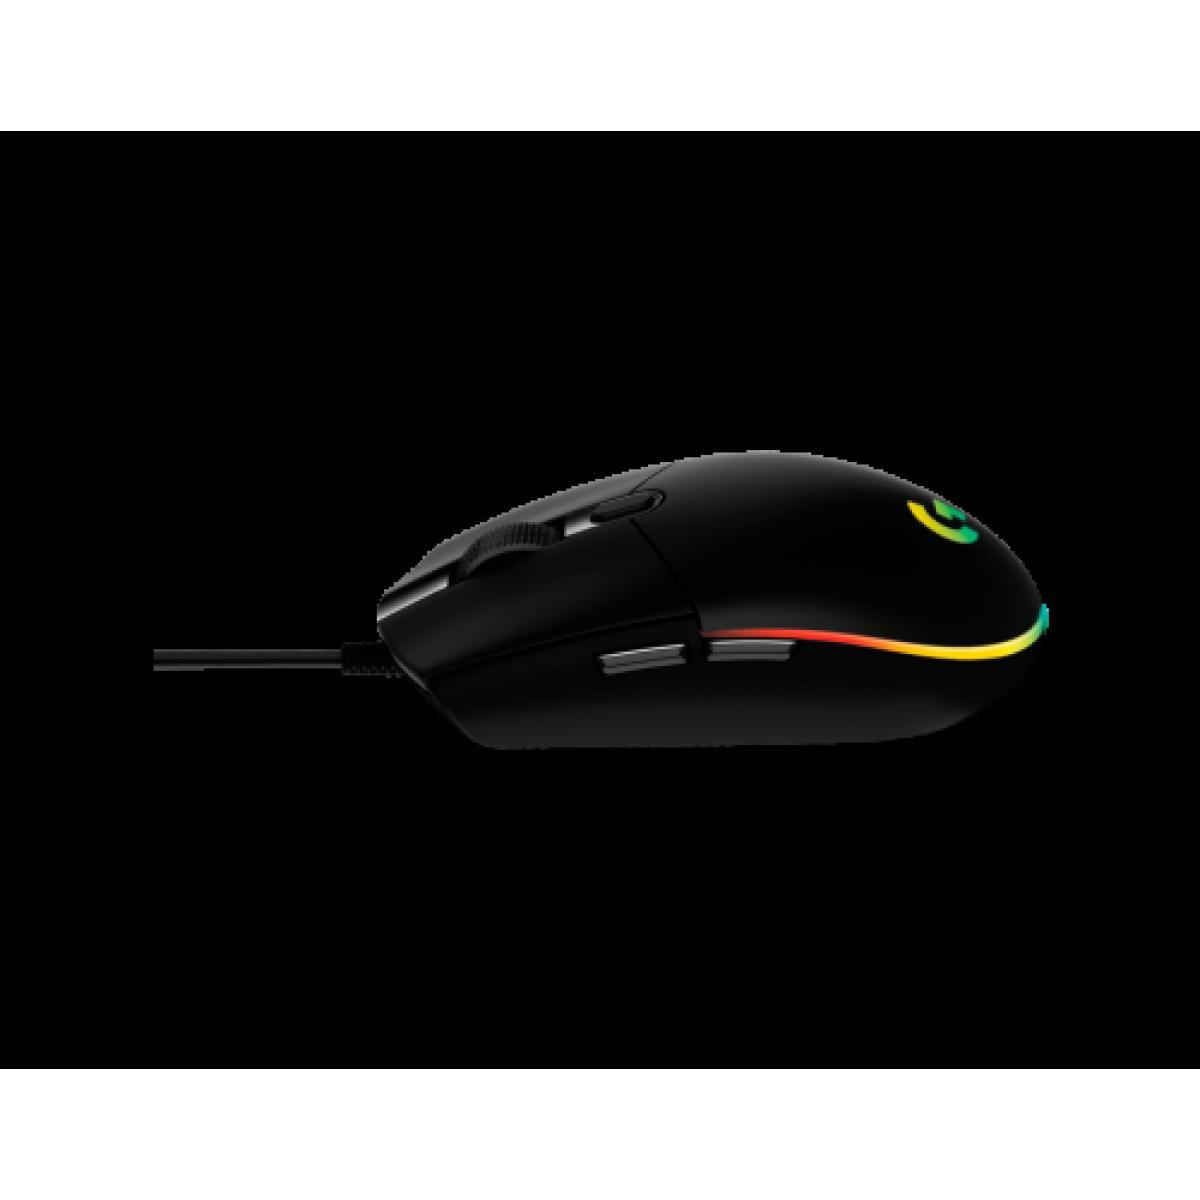 Mouse Gamer Logitech G203 Lightsync RGB, 6 Botões Programáveis, 8000 DPI, Black, 910-005793